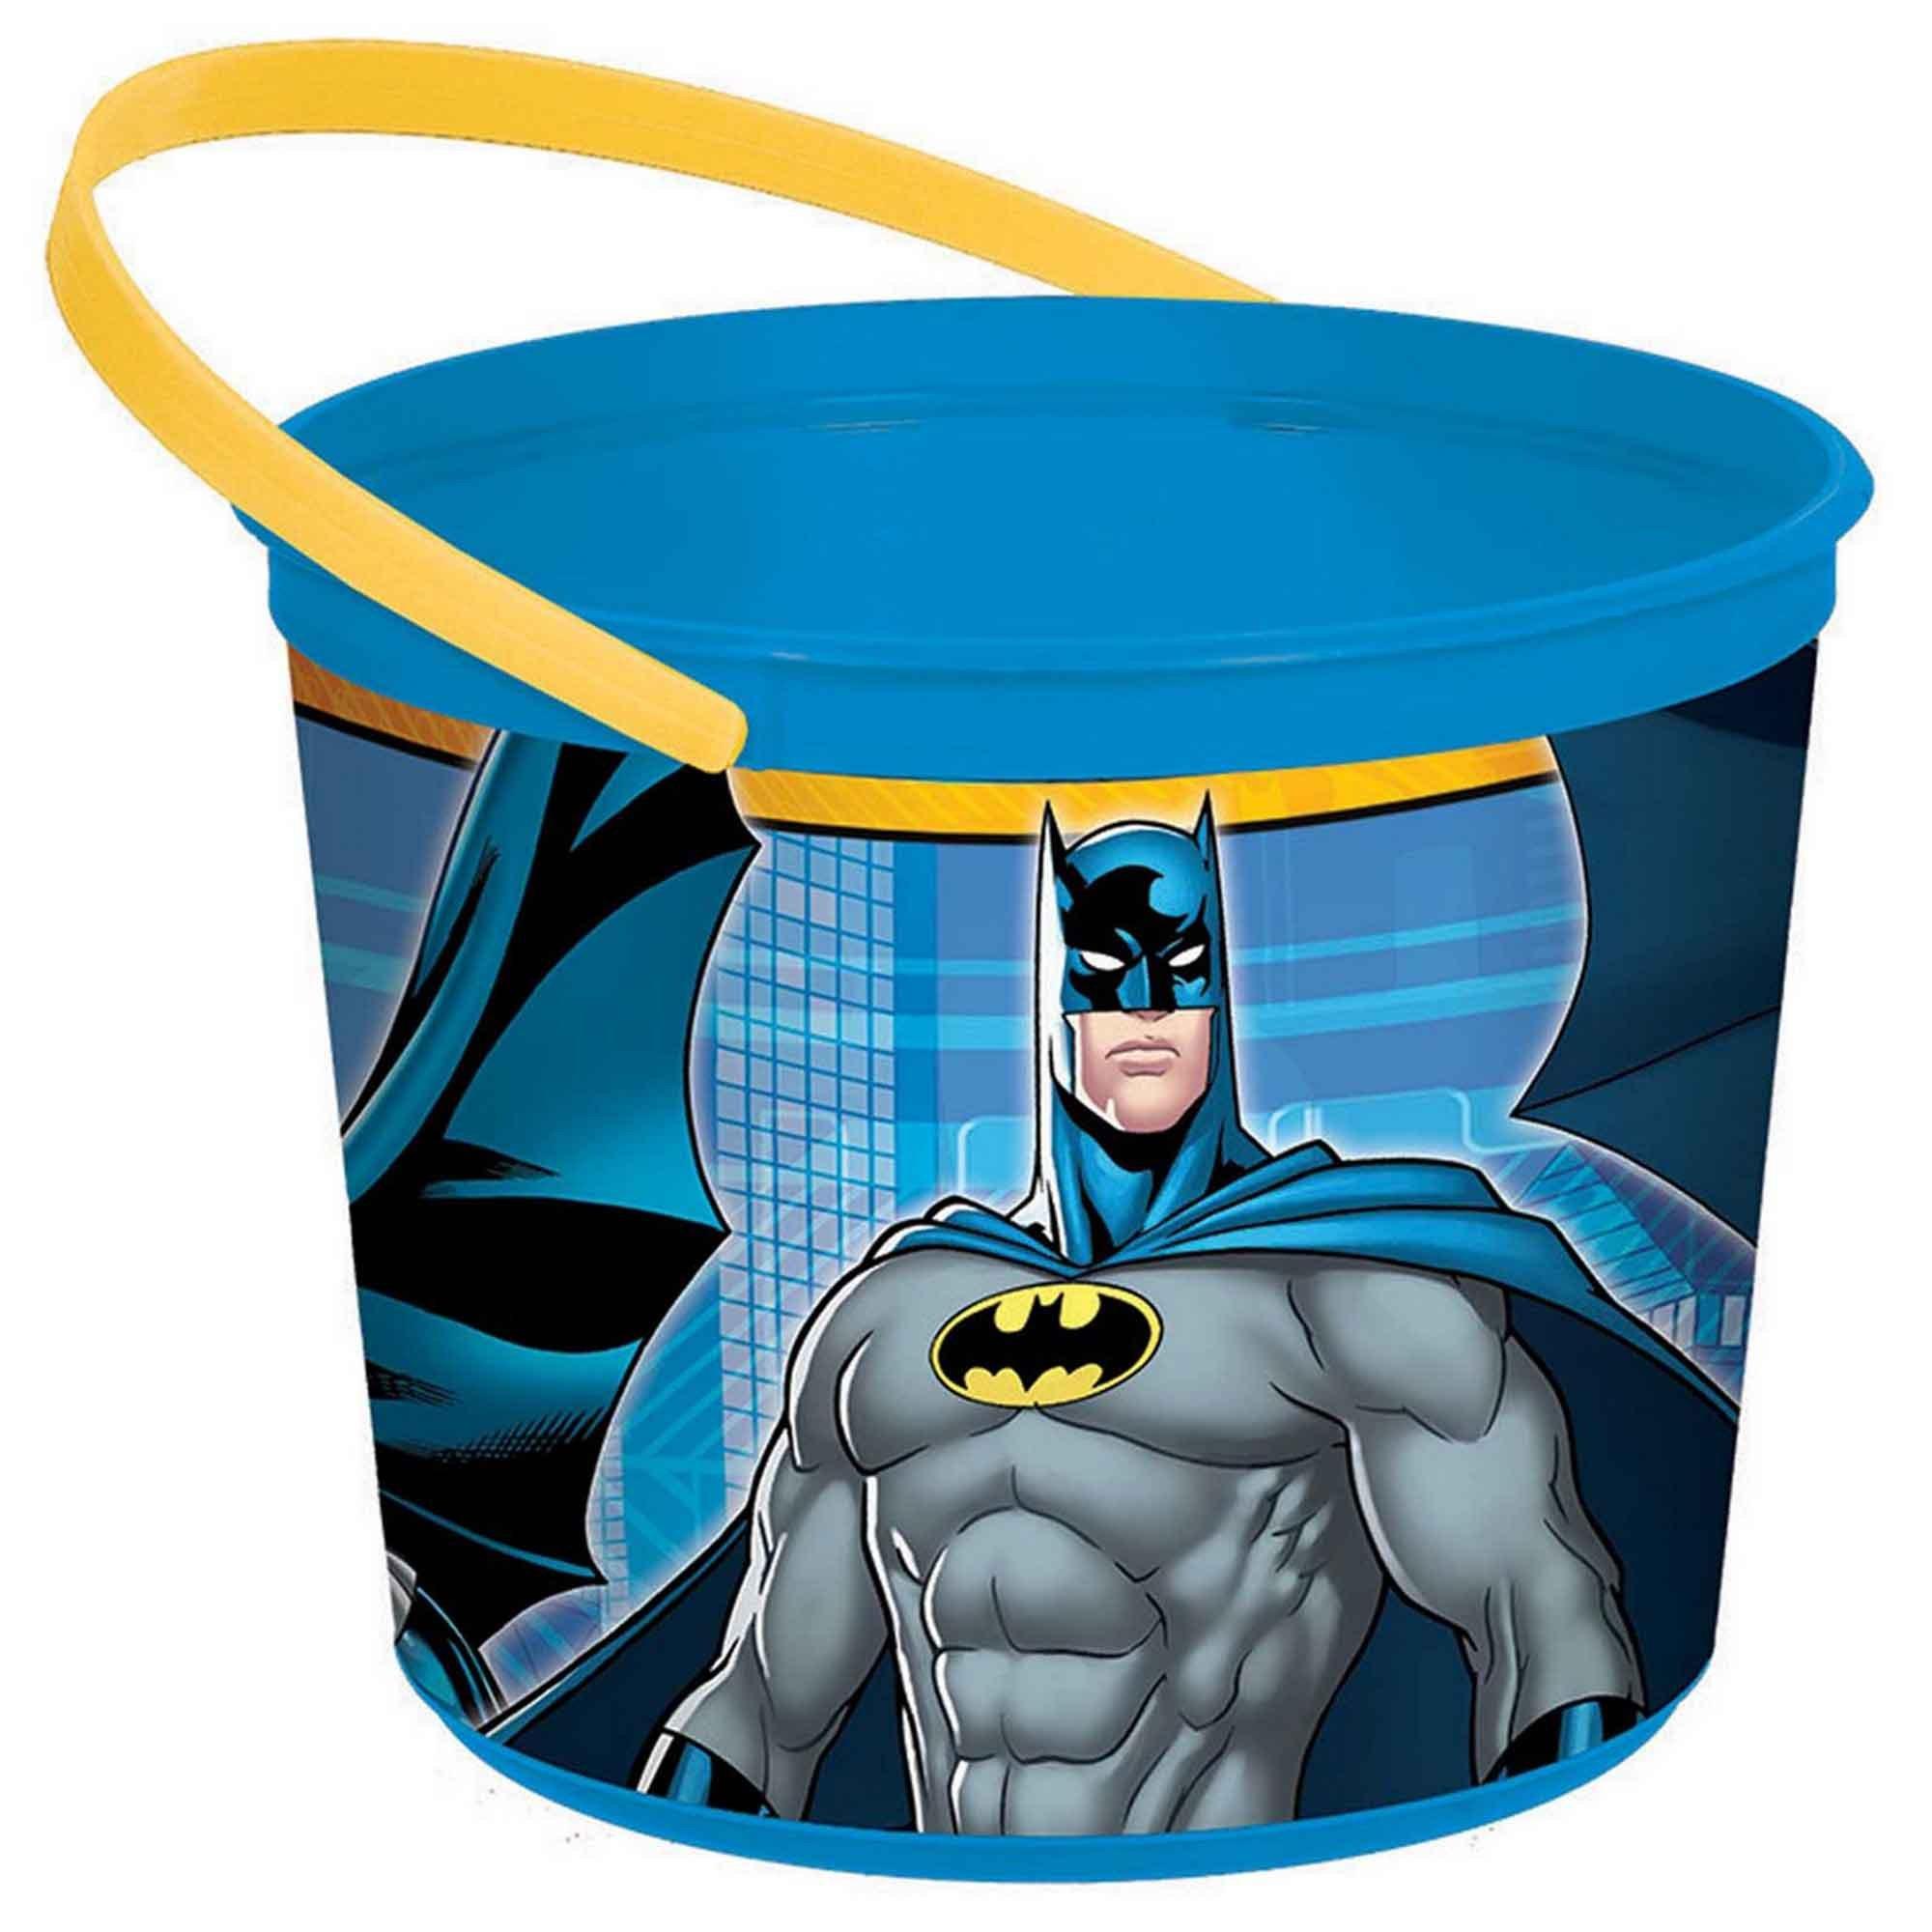 Batman Plastic Favor Container